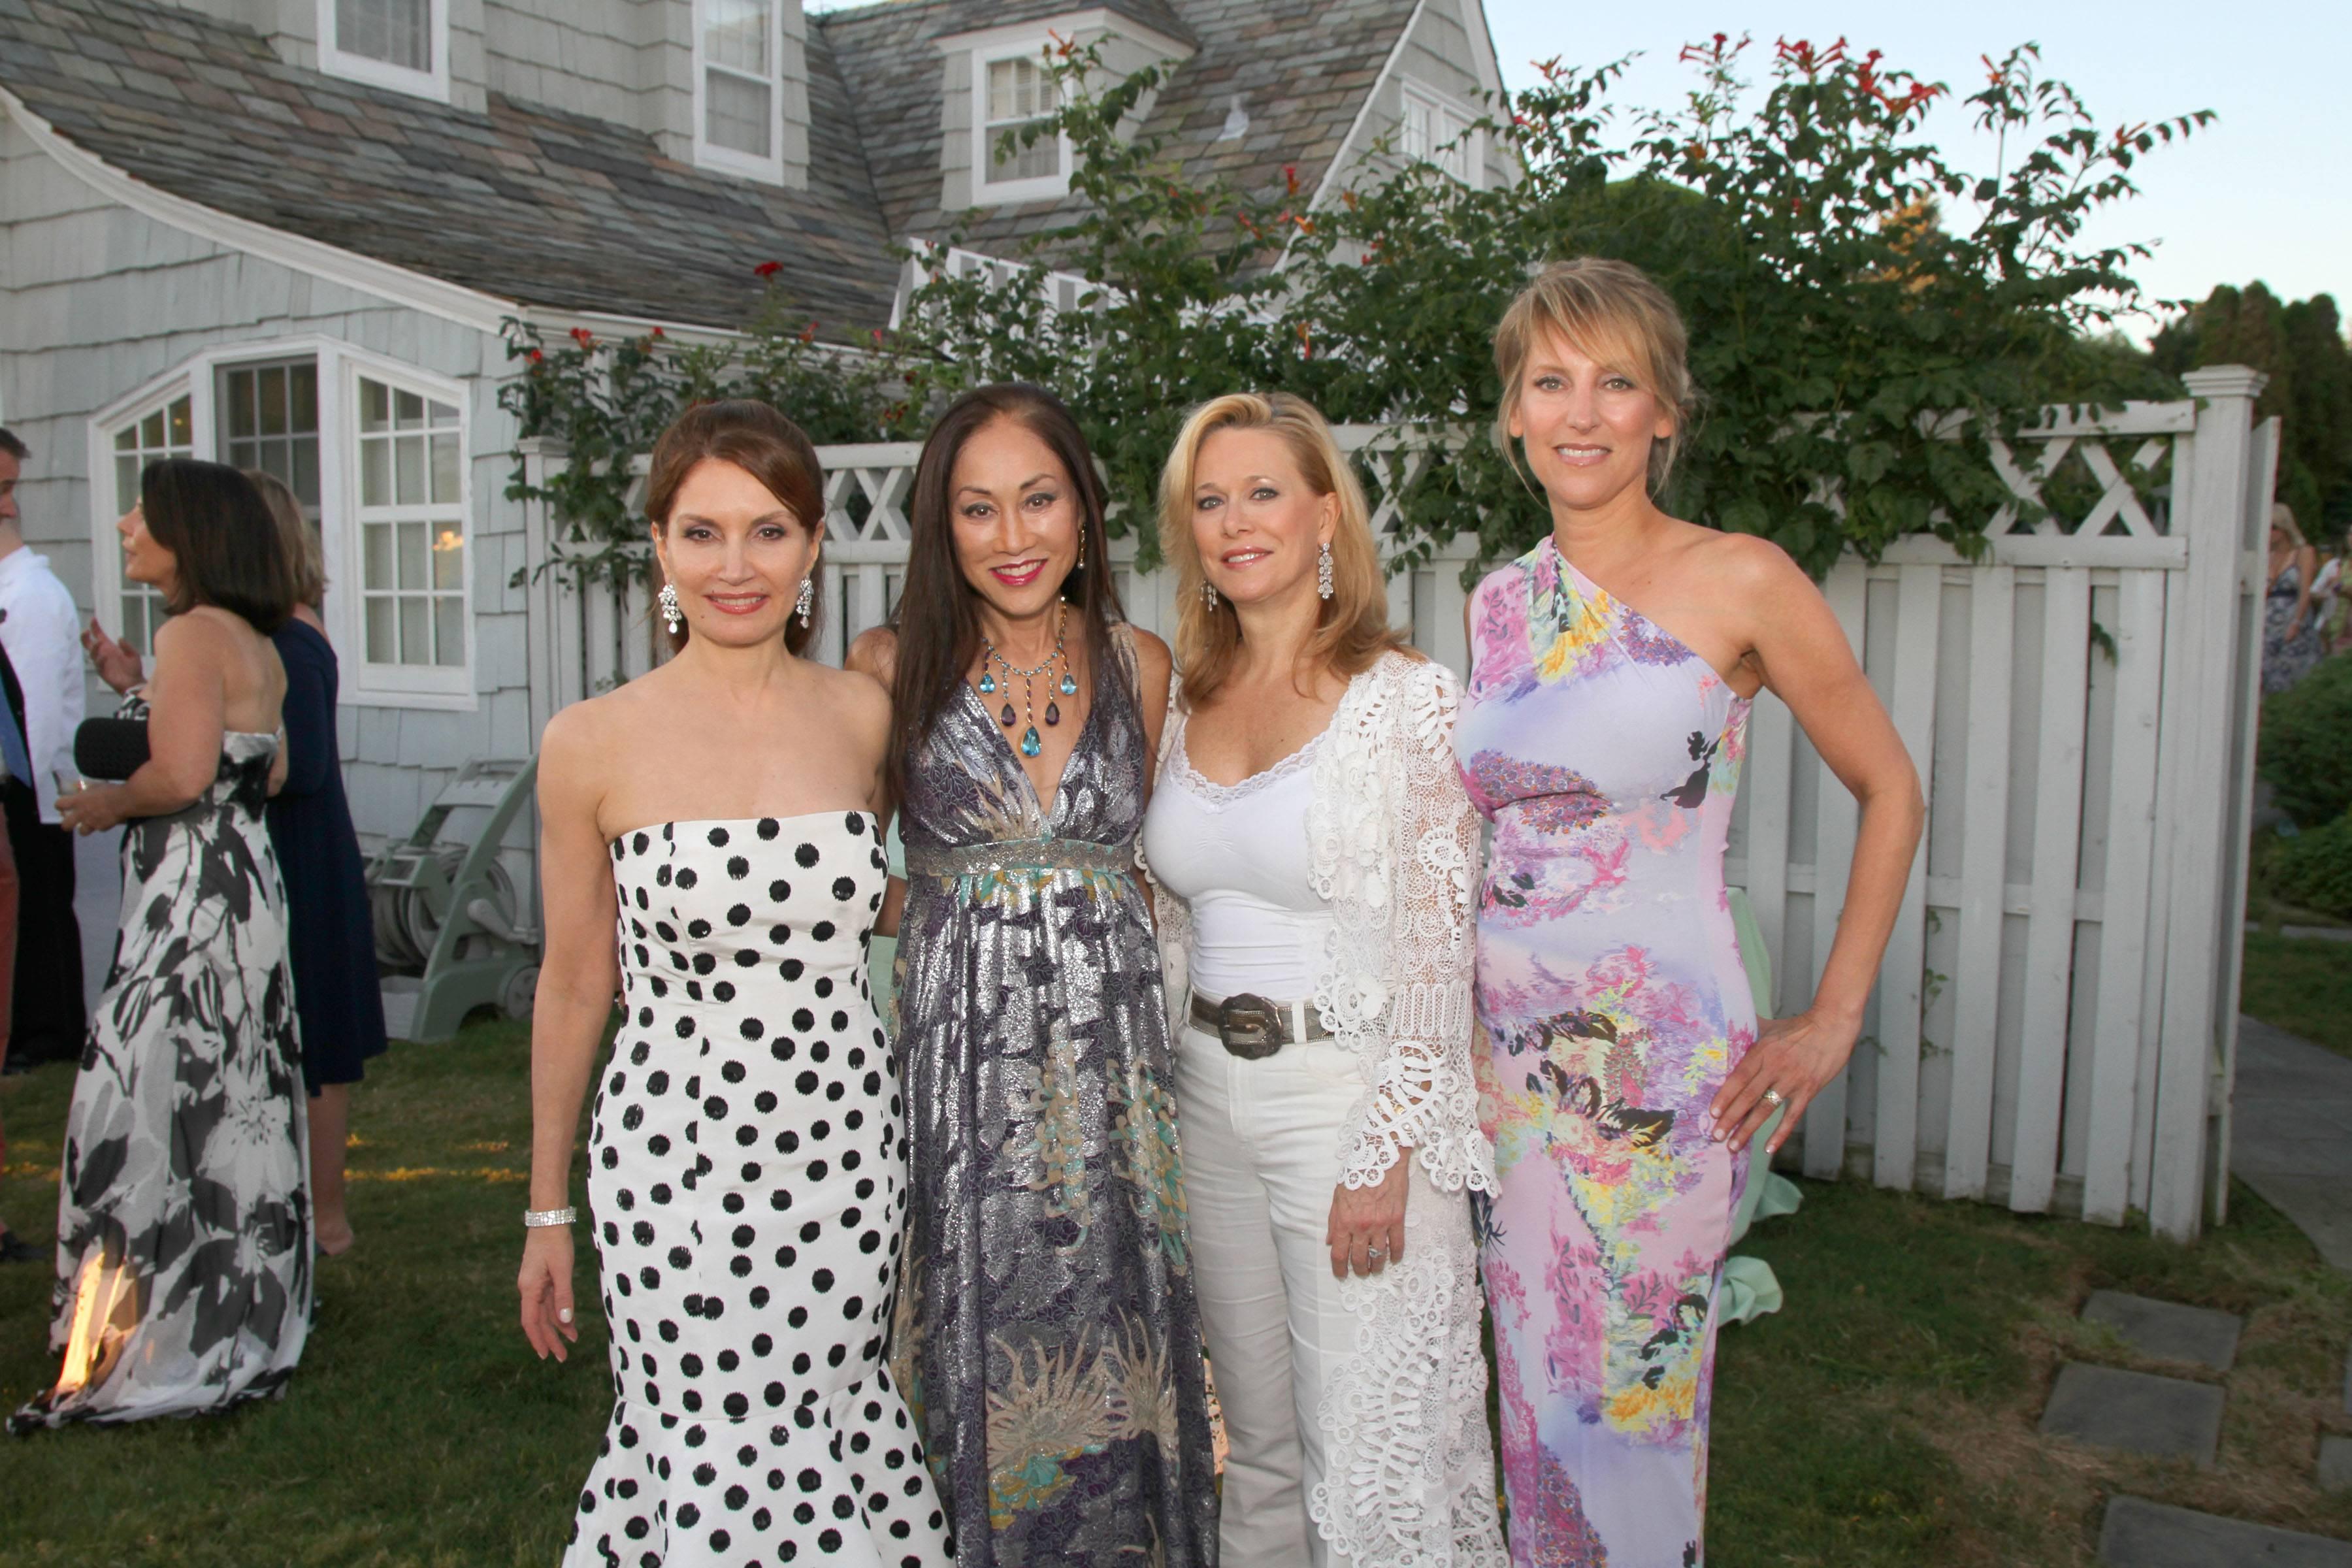 13. Jean Shafiroff, Lucia Hwong Gordon, Kim White, Melanie Wambold